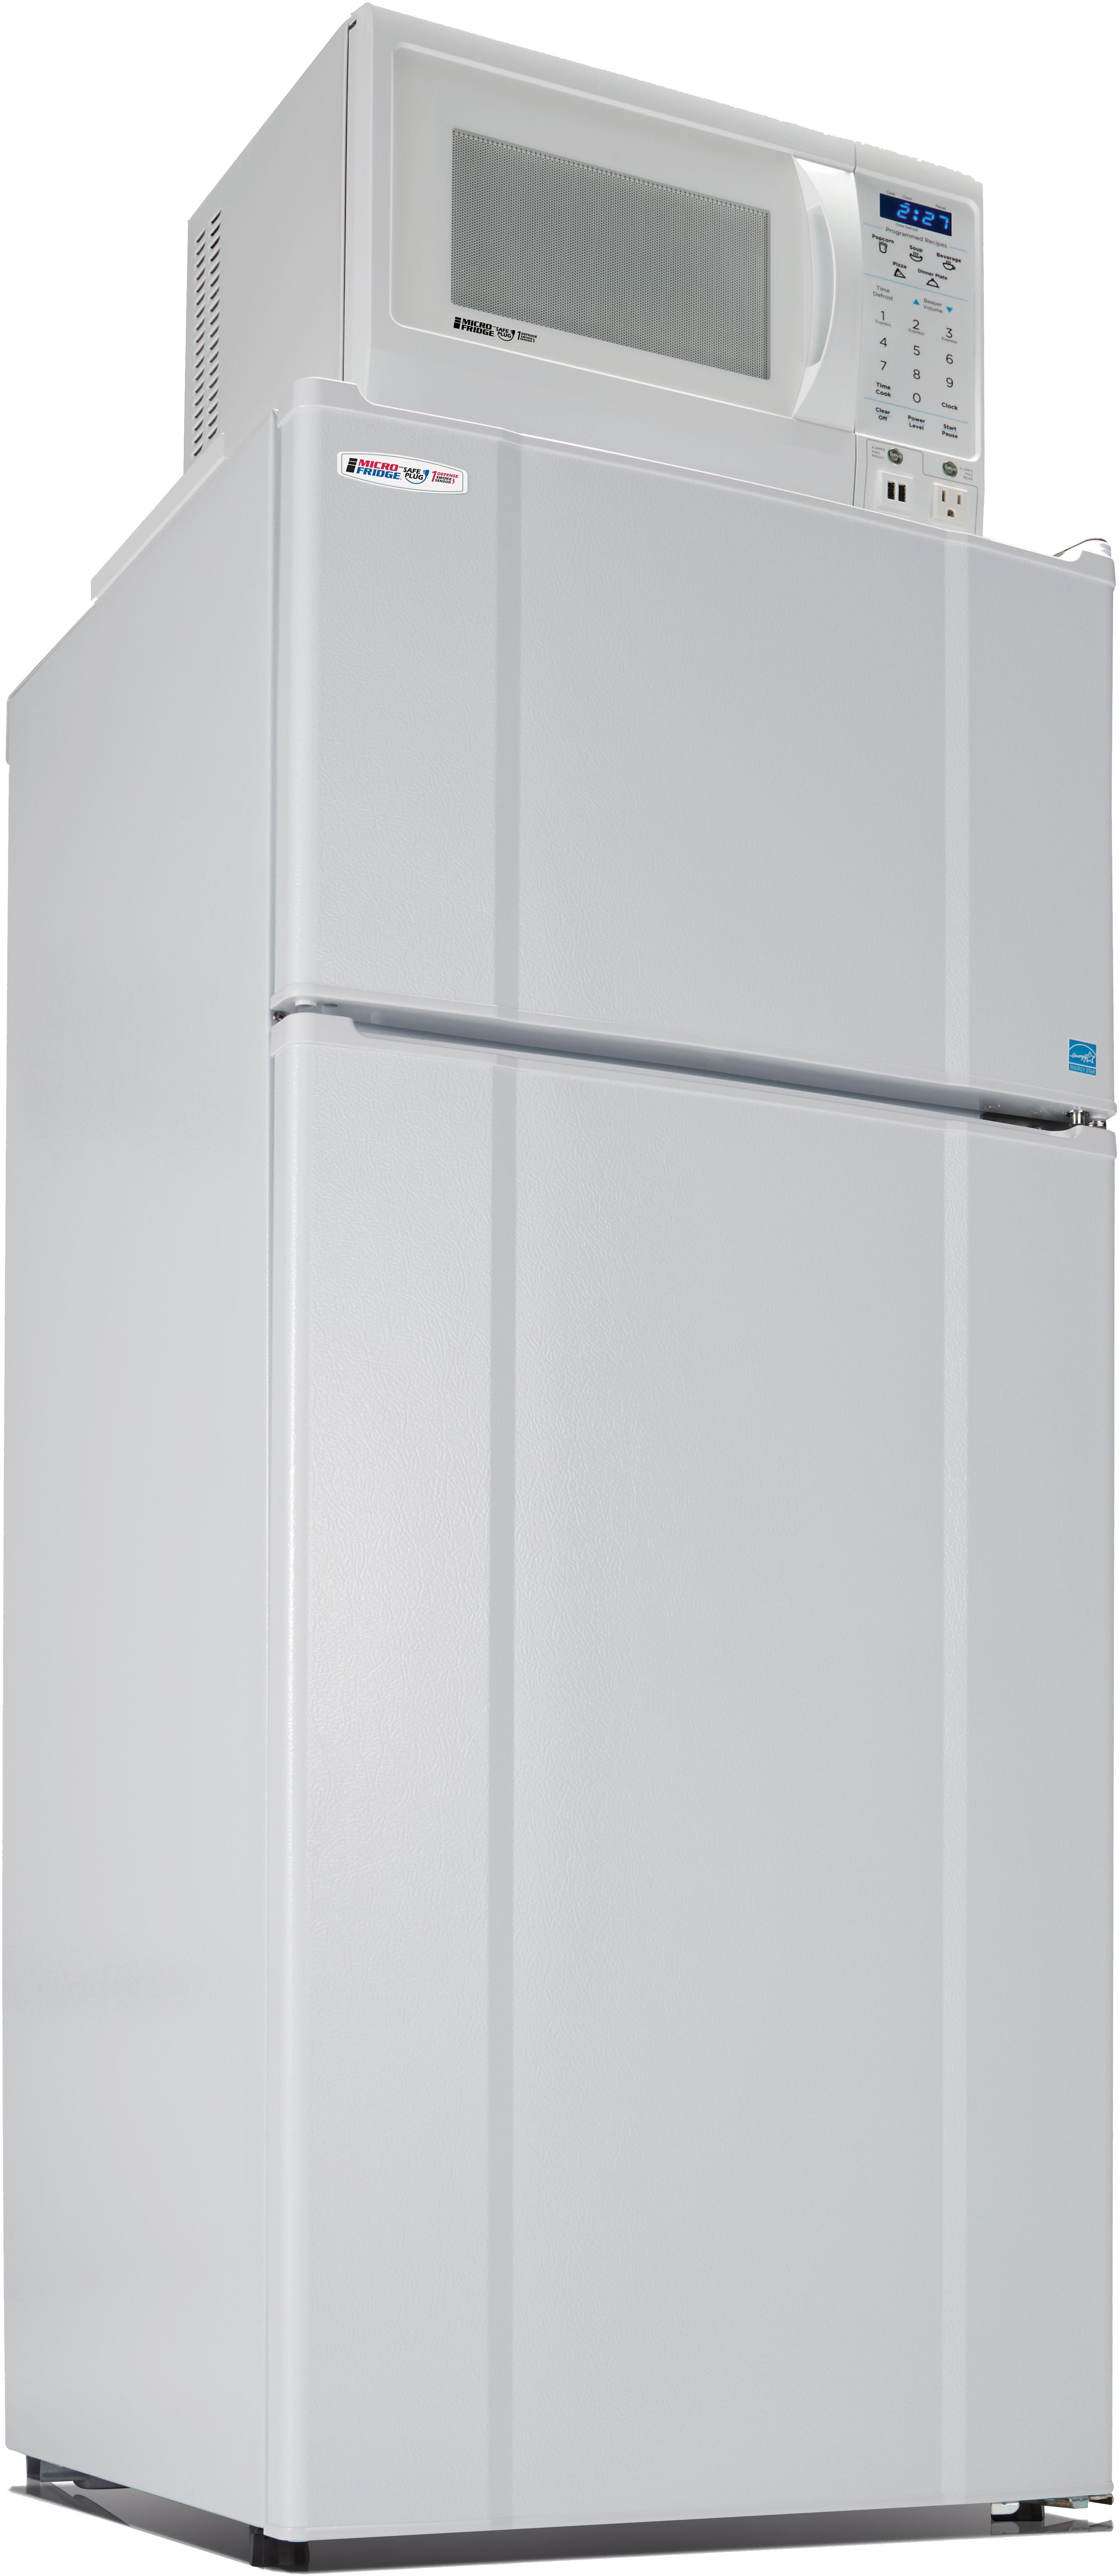 MicroFridge Refrigerator 103RMF49D1W